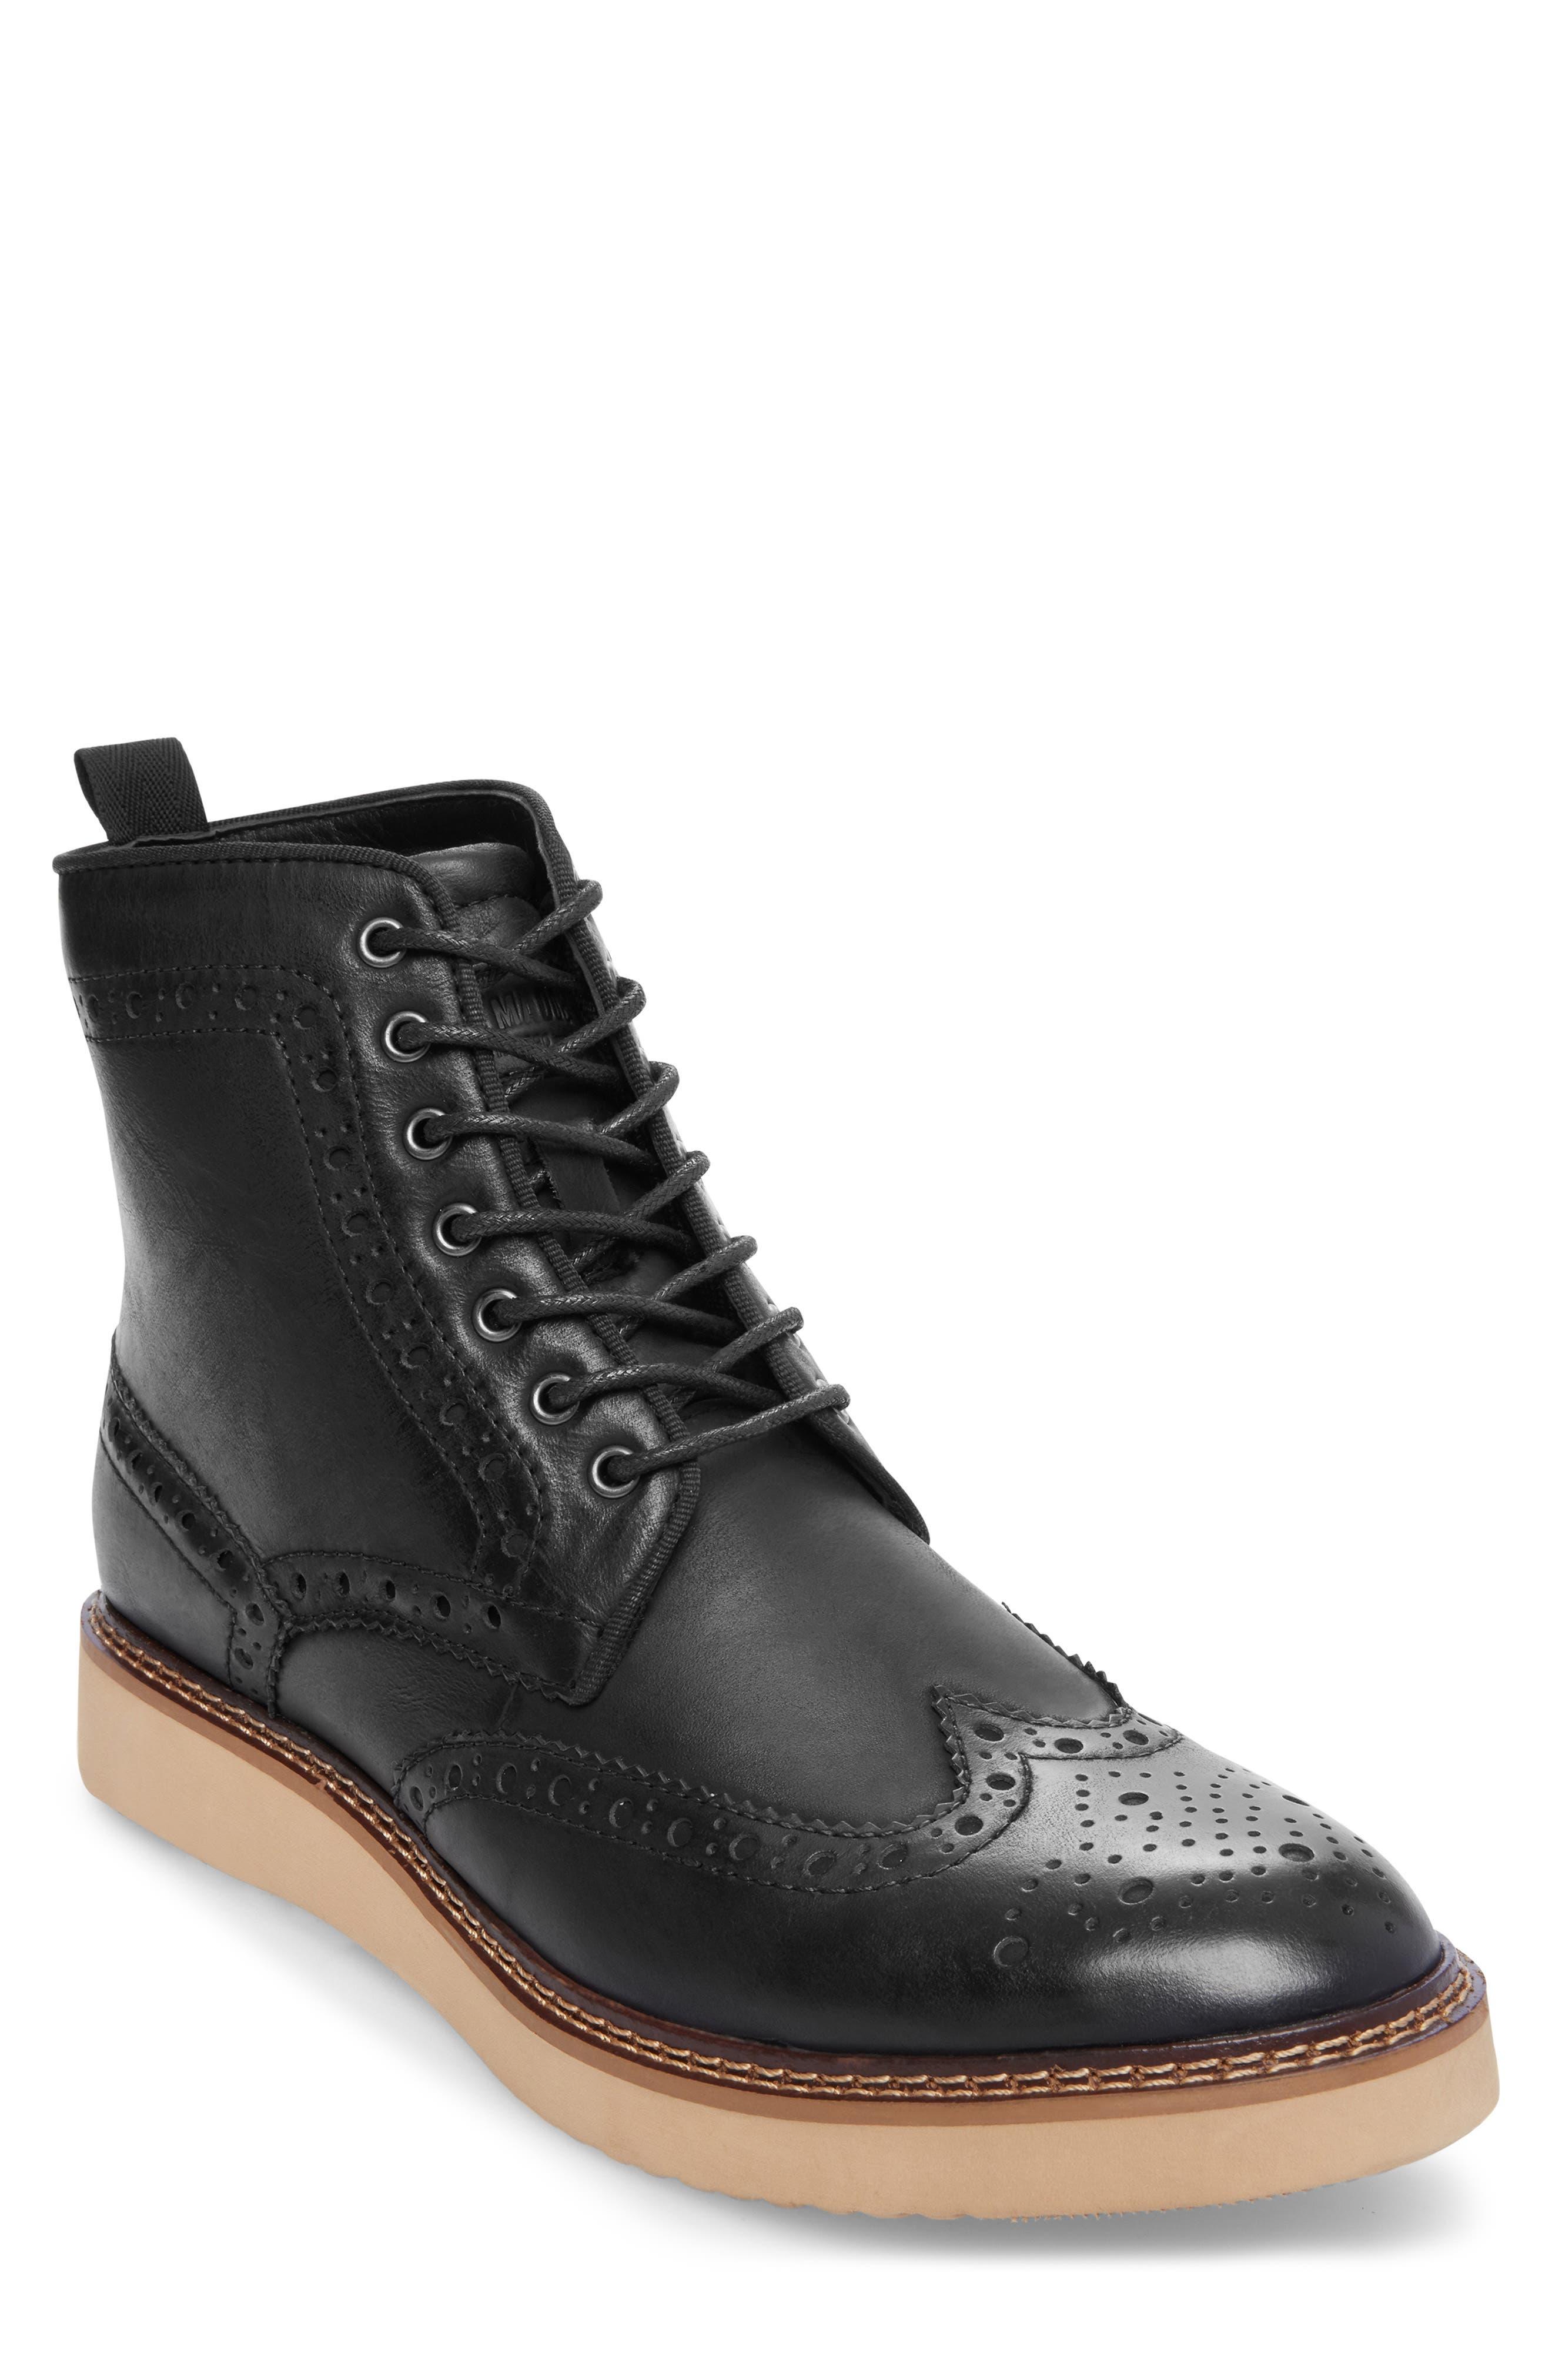 Goddard Wingtip Boot, Main, color, 001